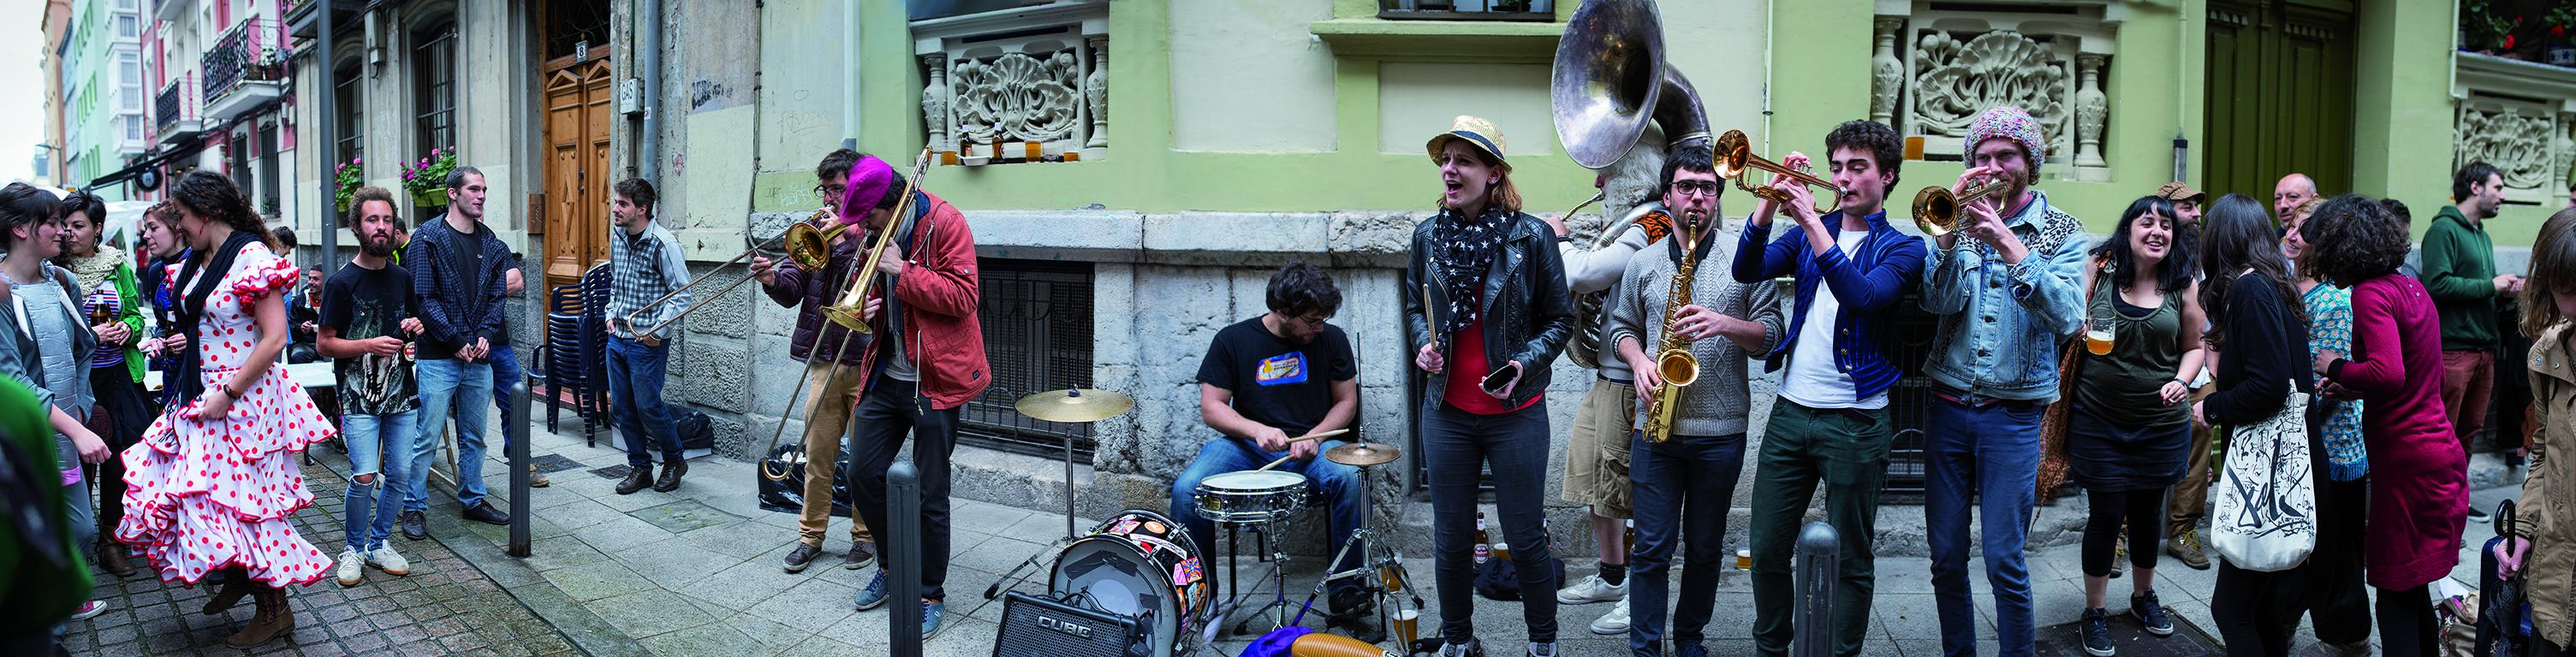 Fiestas de Sol Cultual (Foto: Javier Vila)